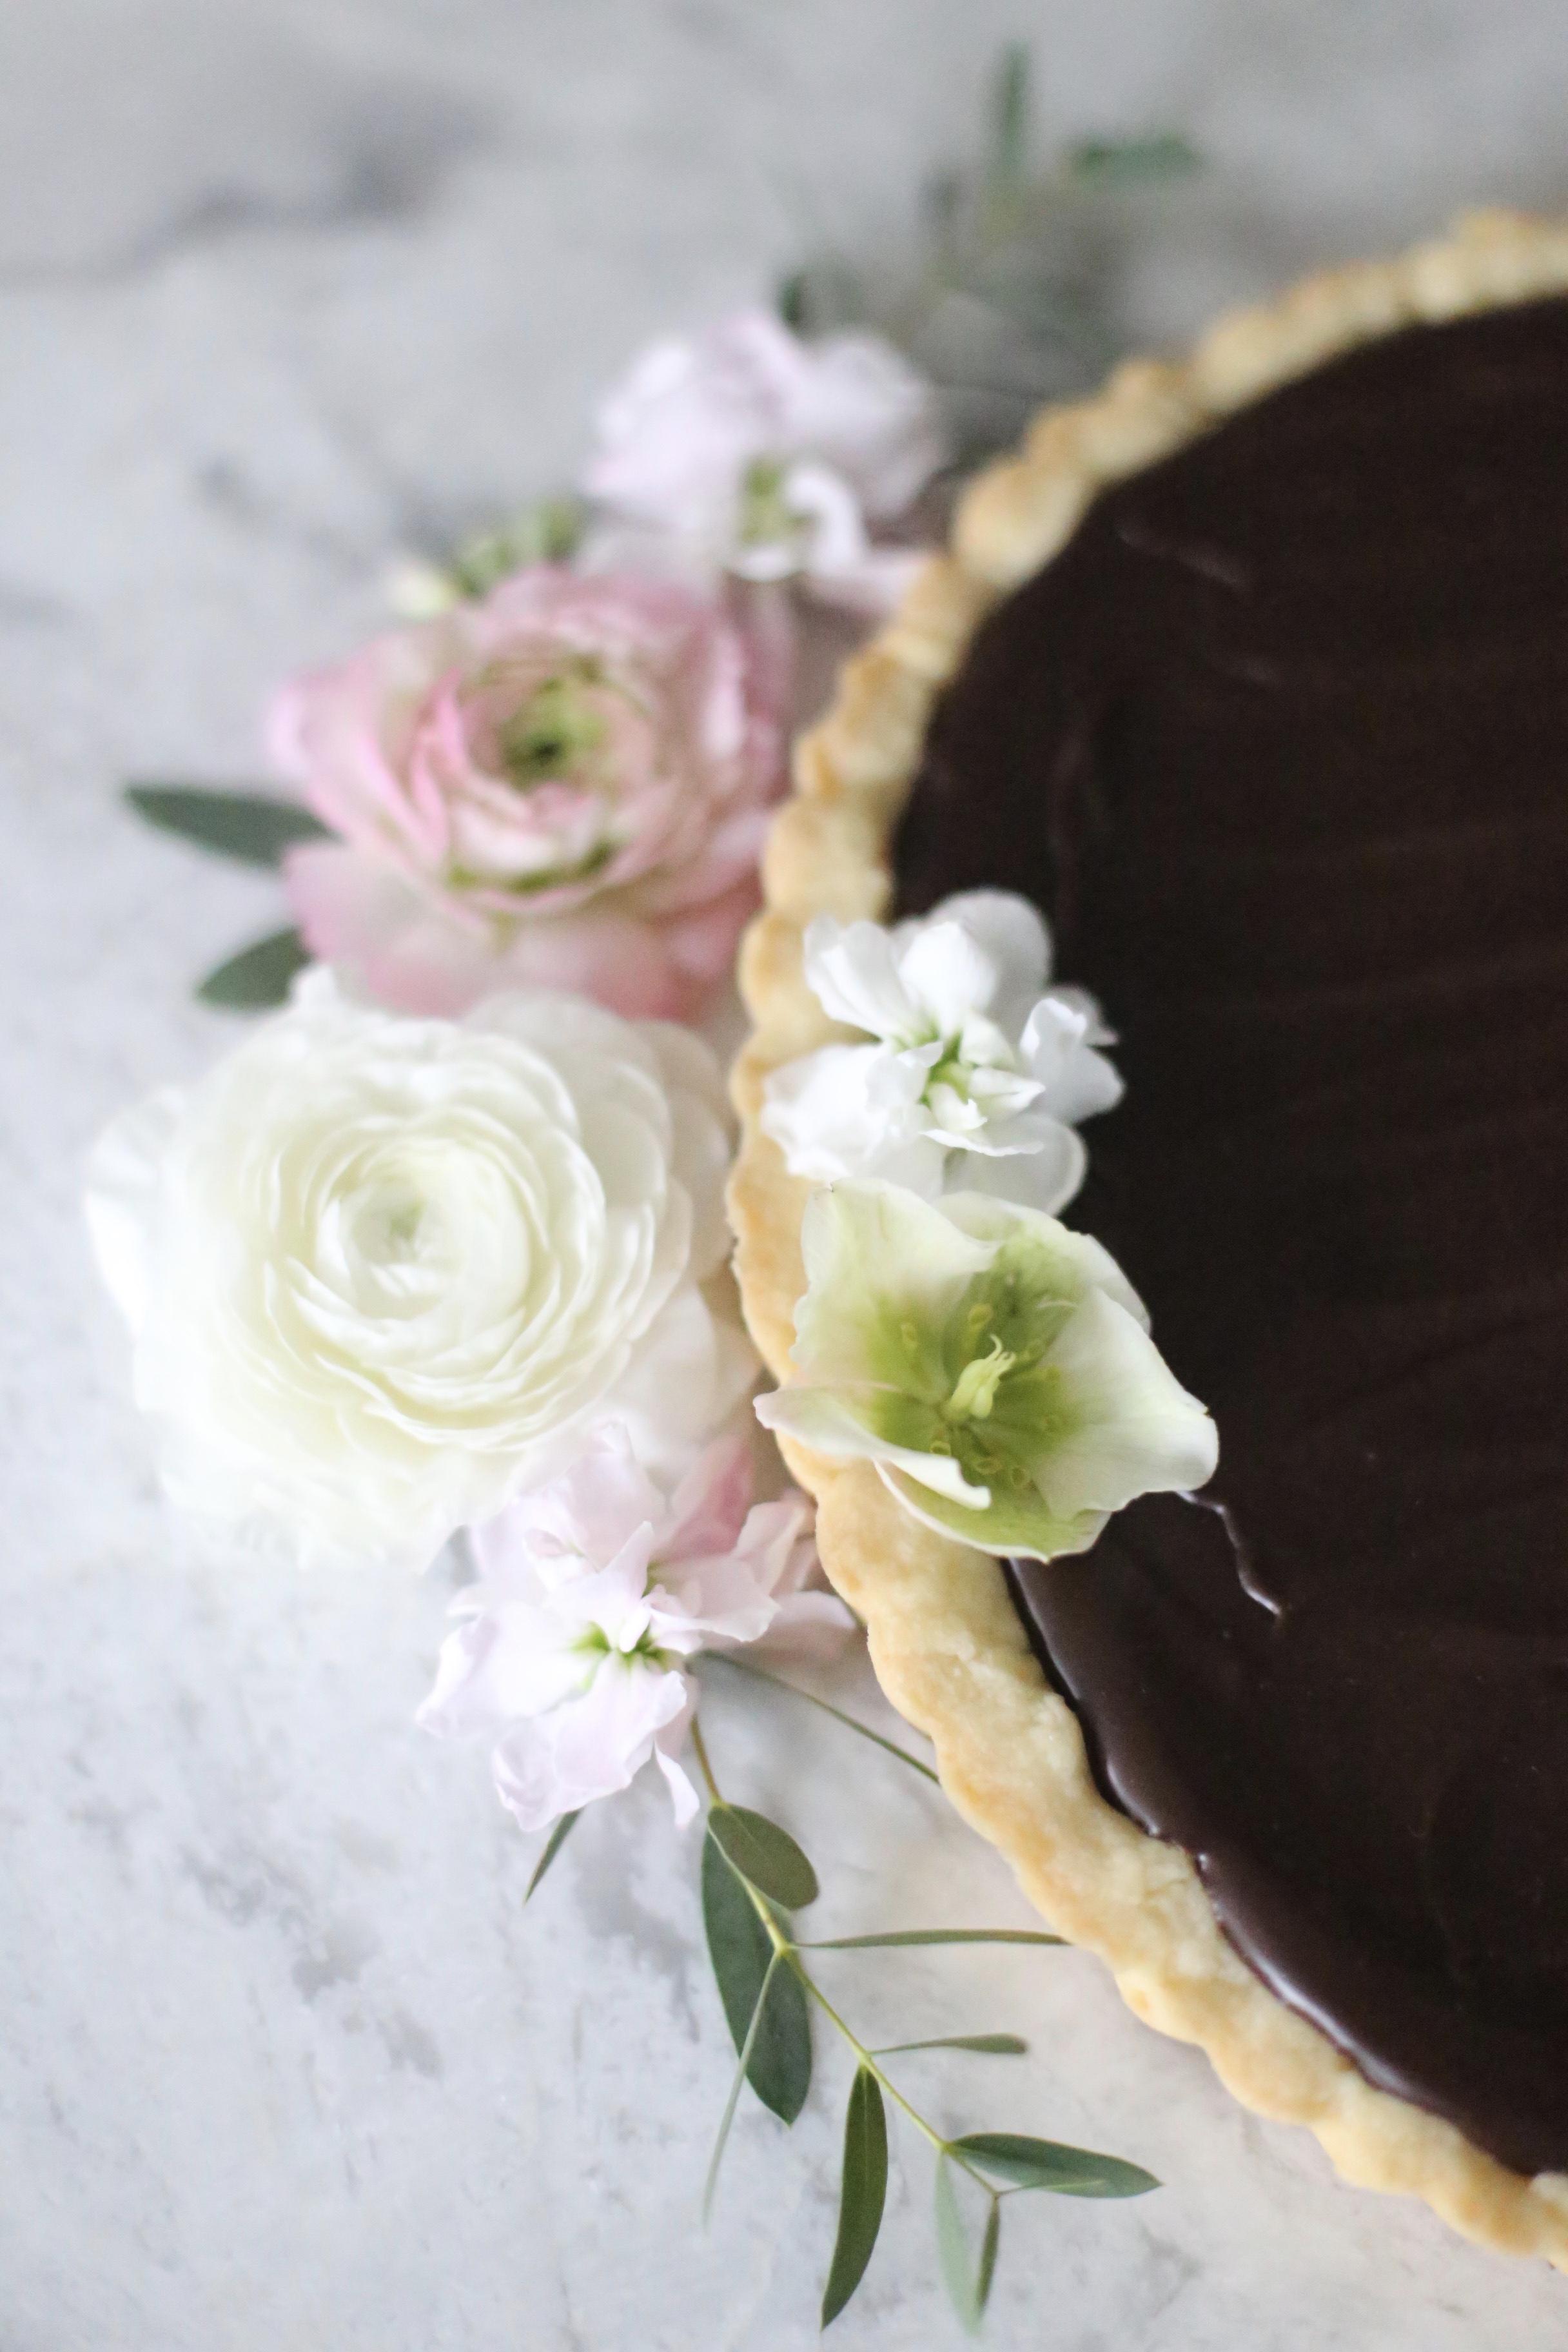 CKT Caramel Chocolate Tart